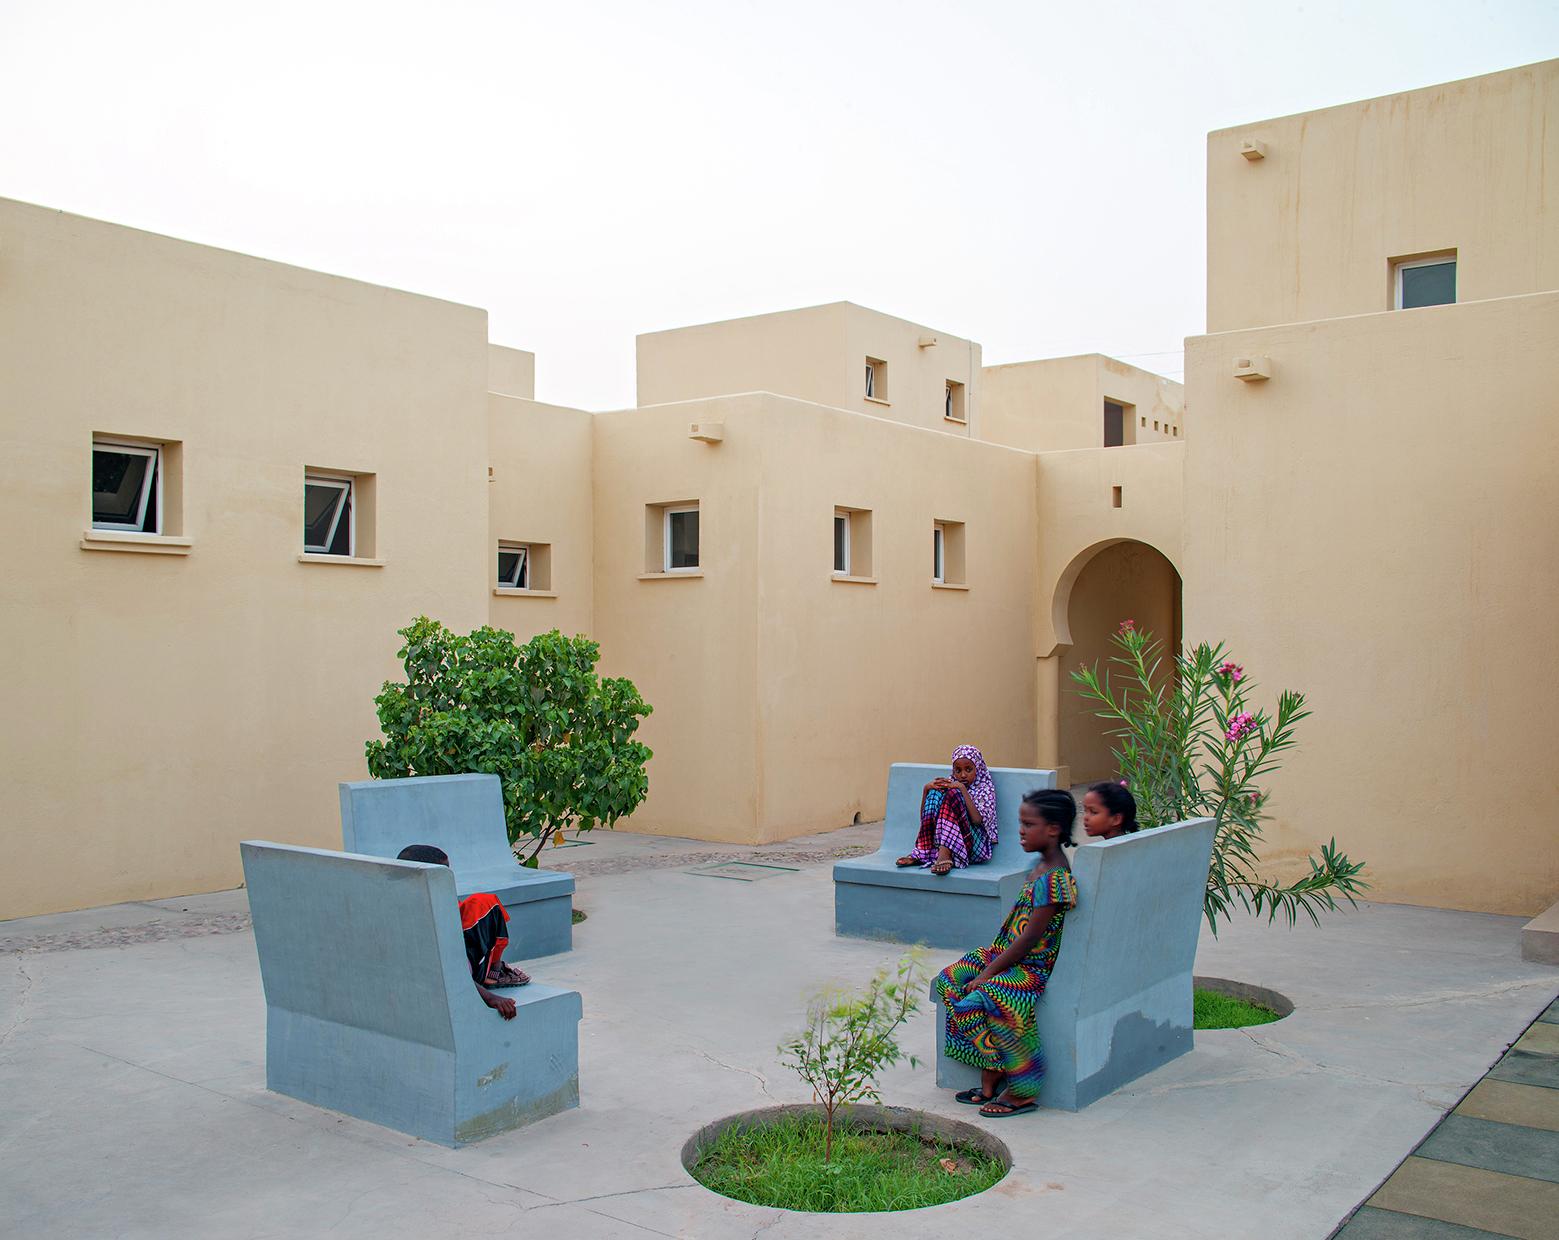 SOS_Village_Djibouti_-_Squares_(10).jpg